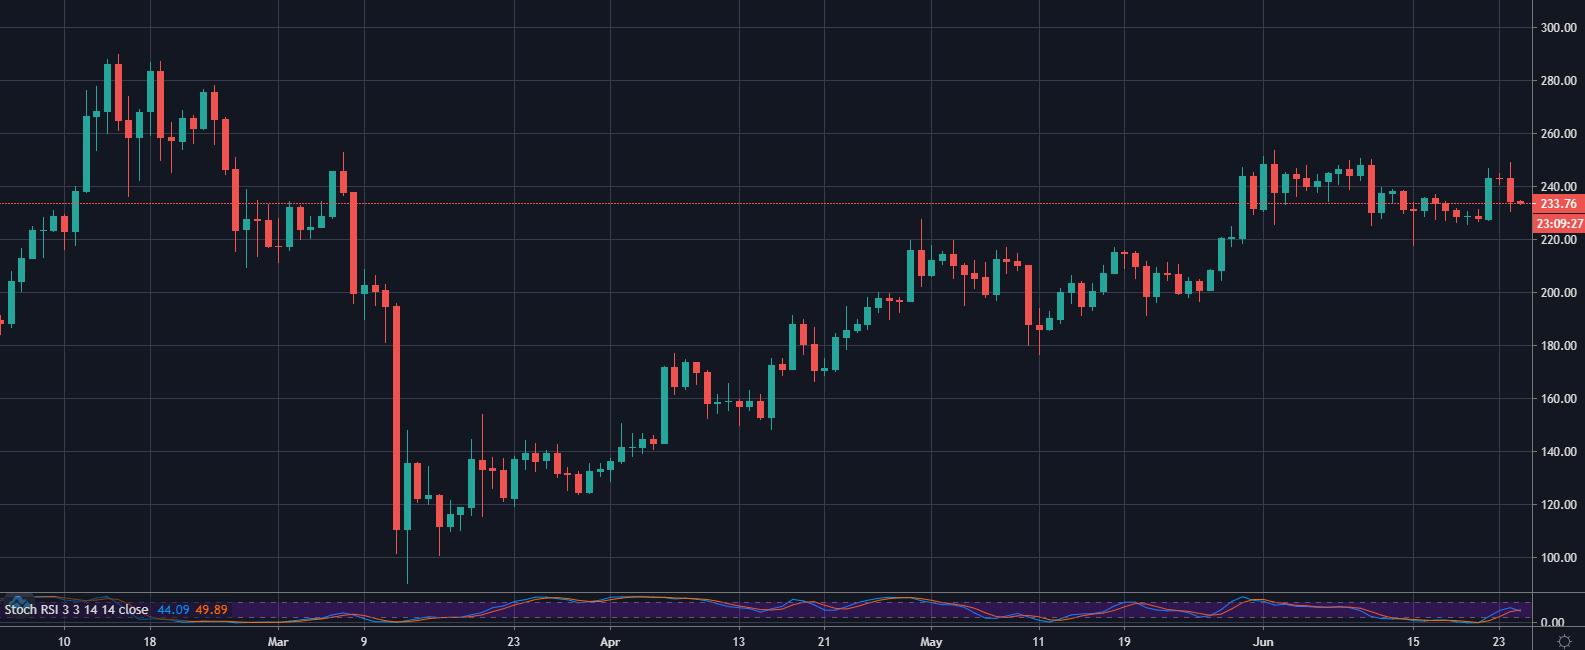 ETH / USD sur Coinbase, 1D